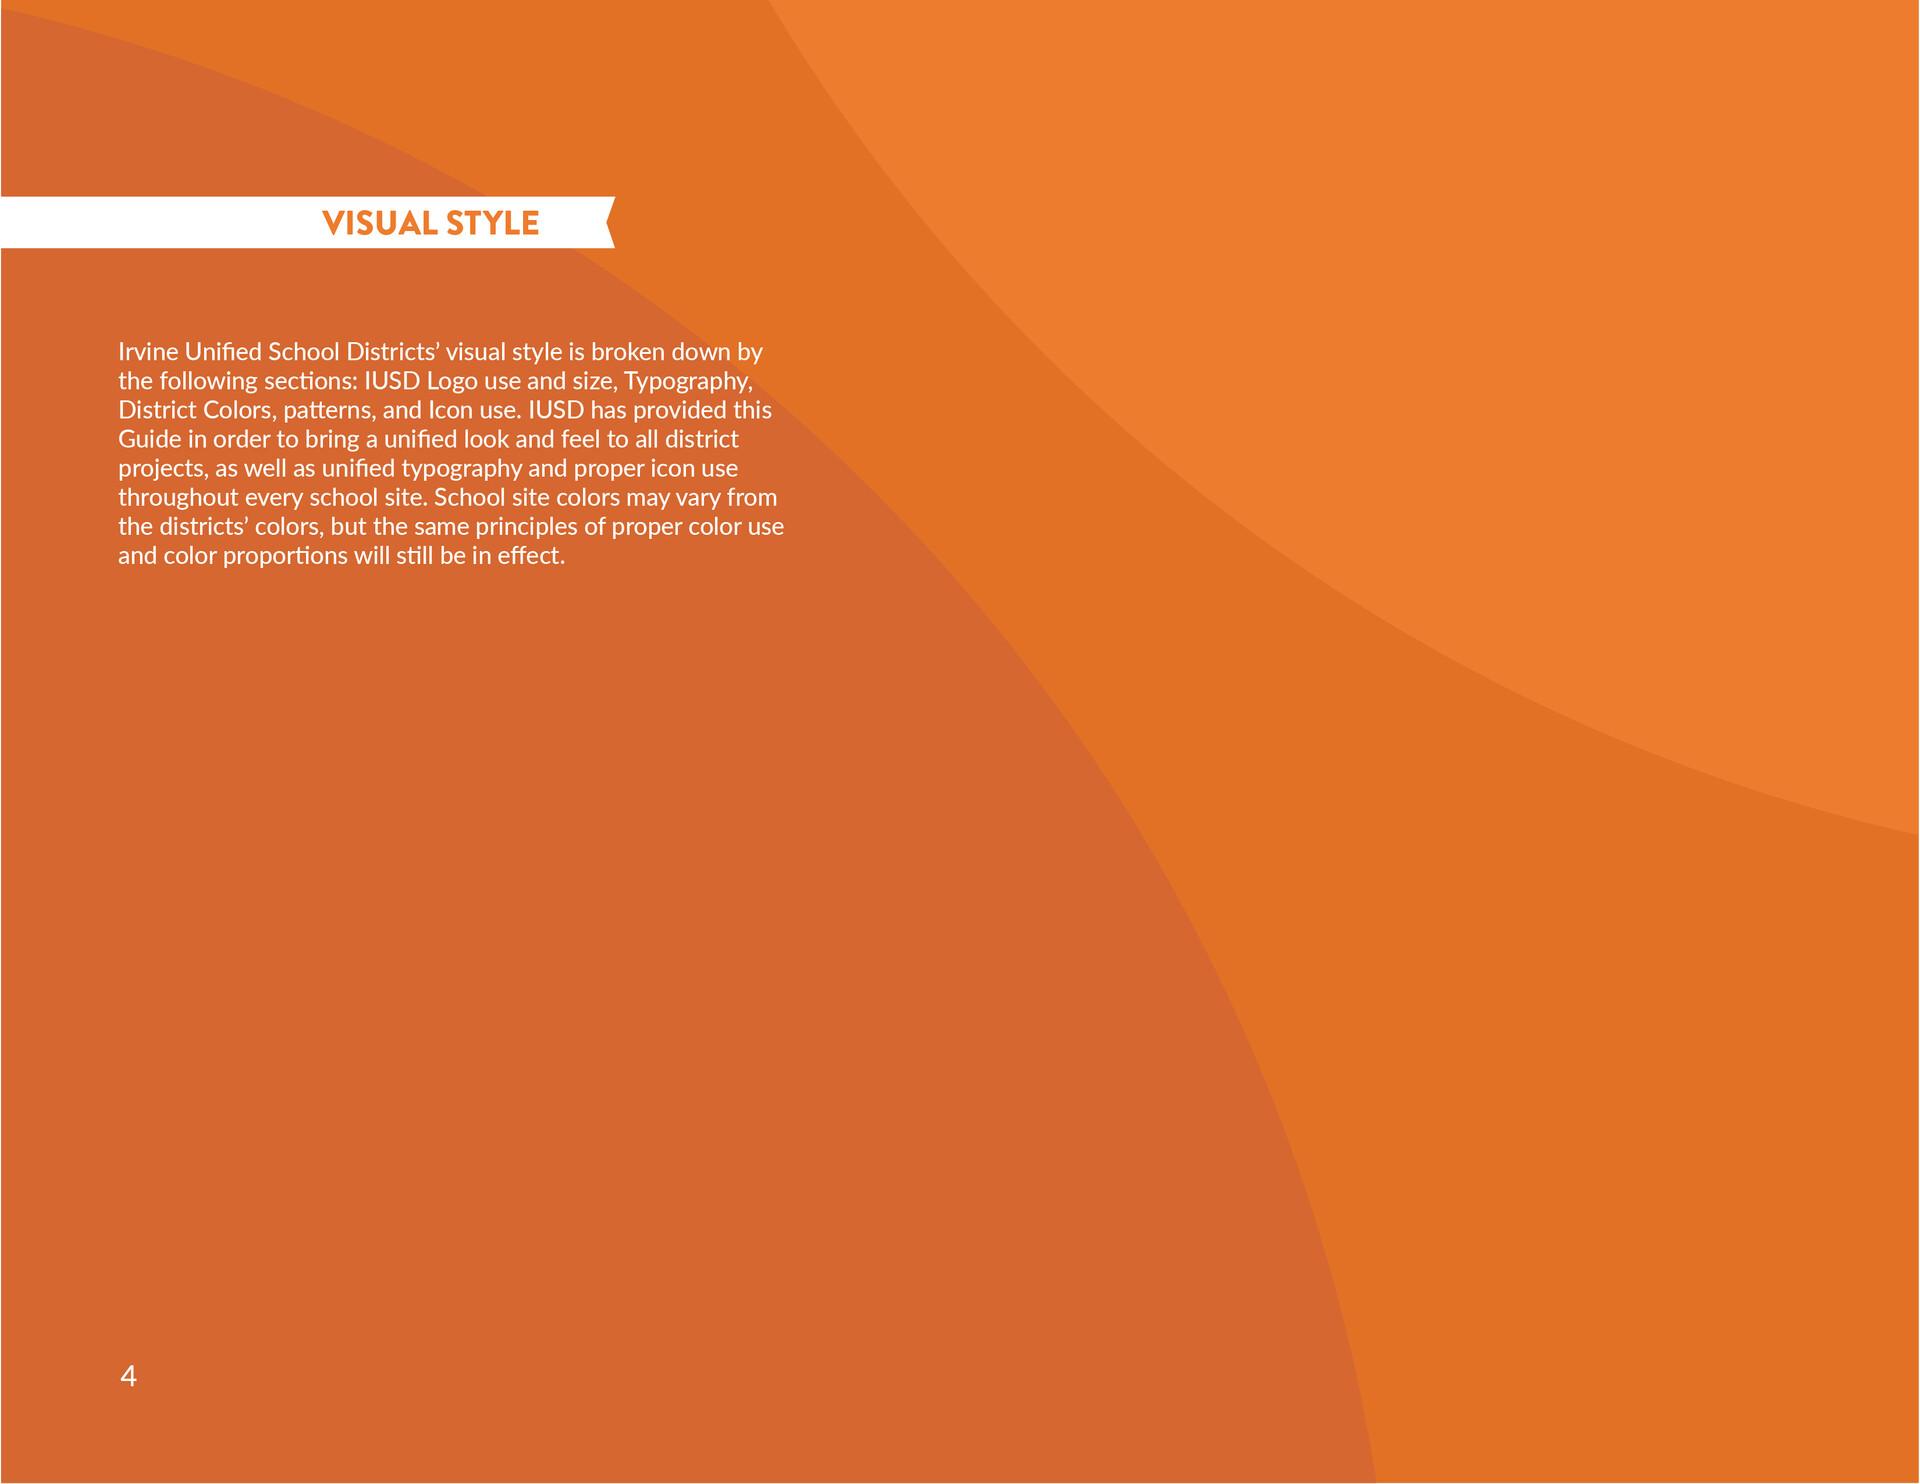 Kyle miller iusd intranet branding manual 2019 4